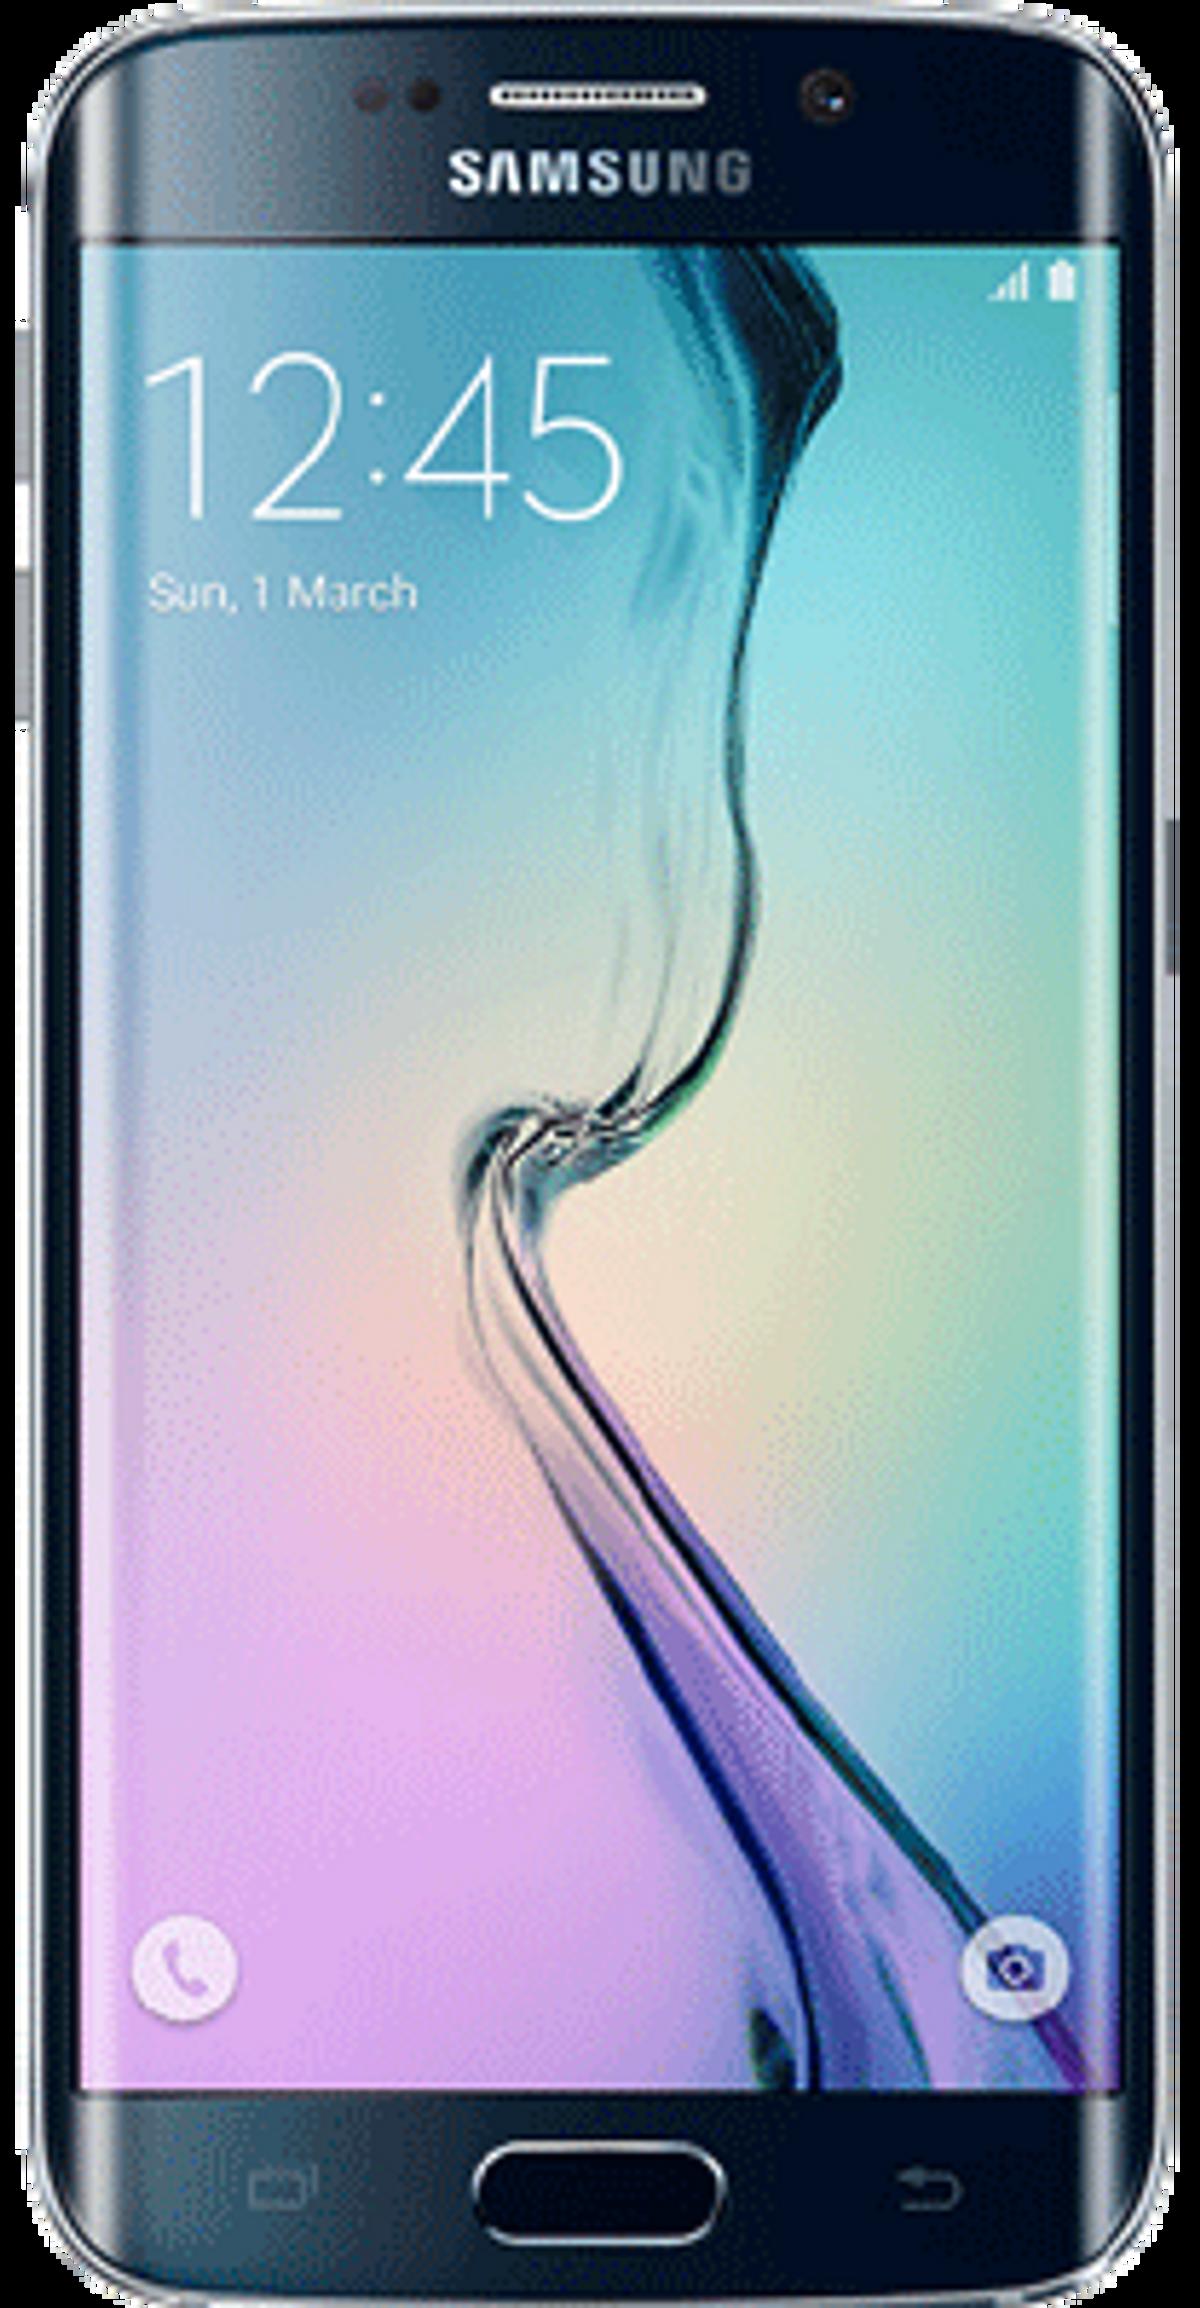 सॅमसंग गॅलेक्सी S6 Edge